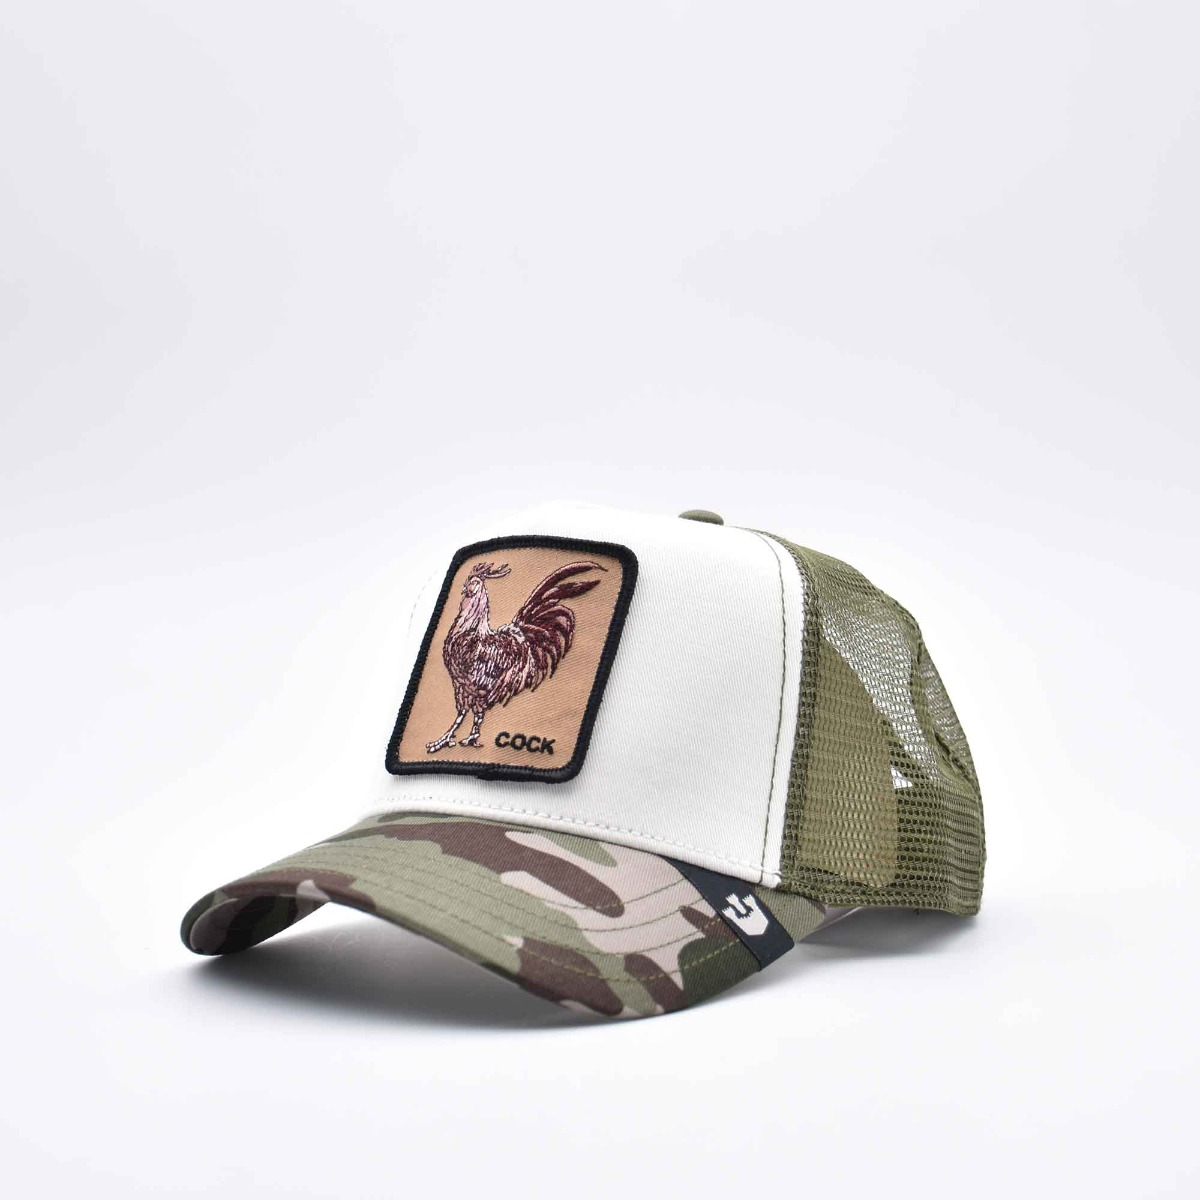 Baseball cock - Camouflage